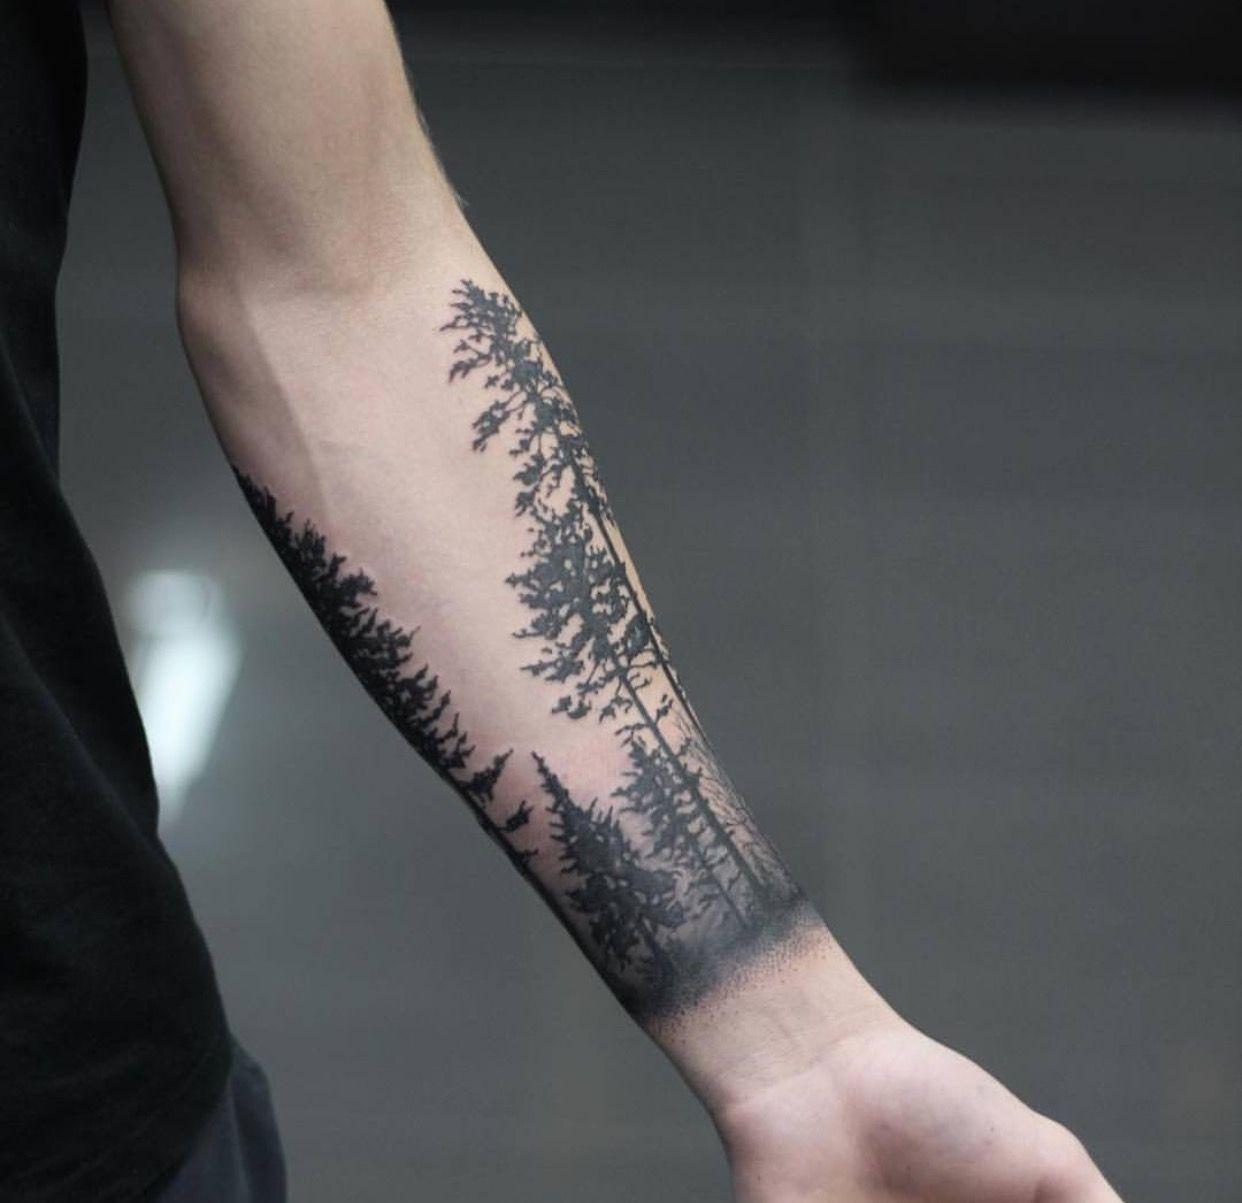 Tatouage interieur biceps femme galerie tatouage - Tatouage biceps femme ...